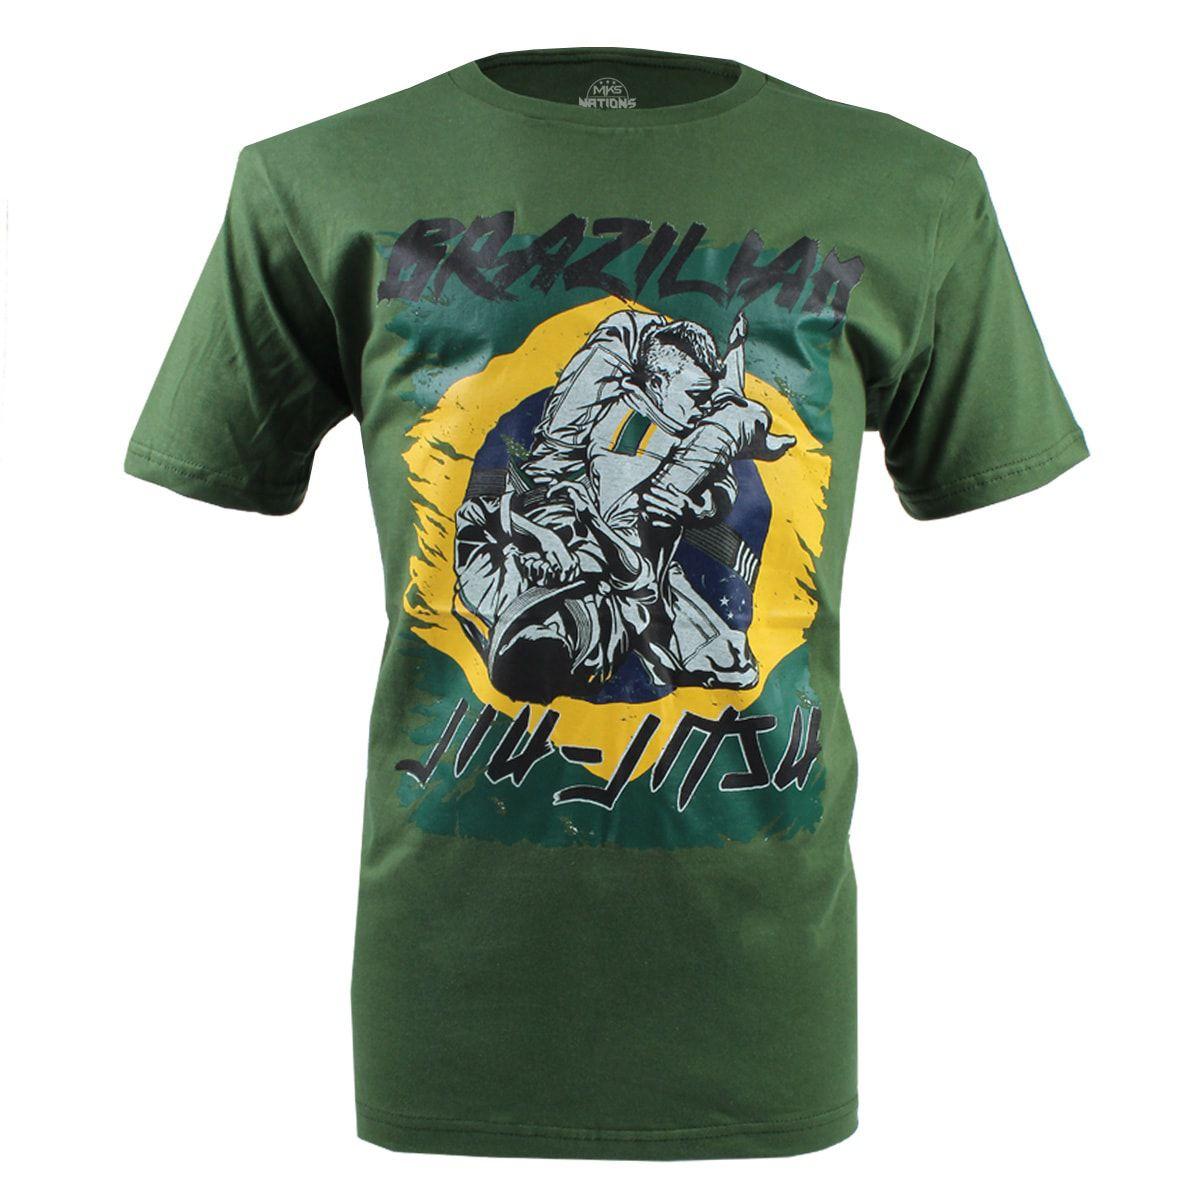 Camiseta MKS Nations Brazilian Jiu-Jitsu - Verde